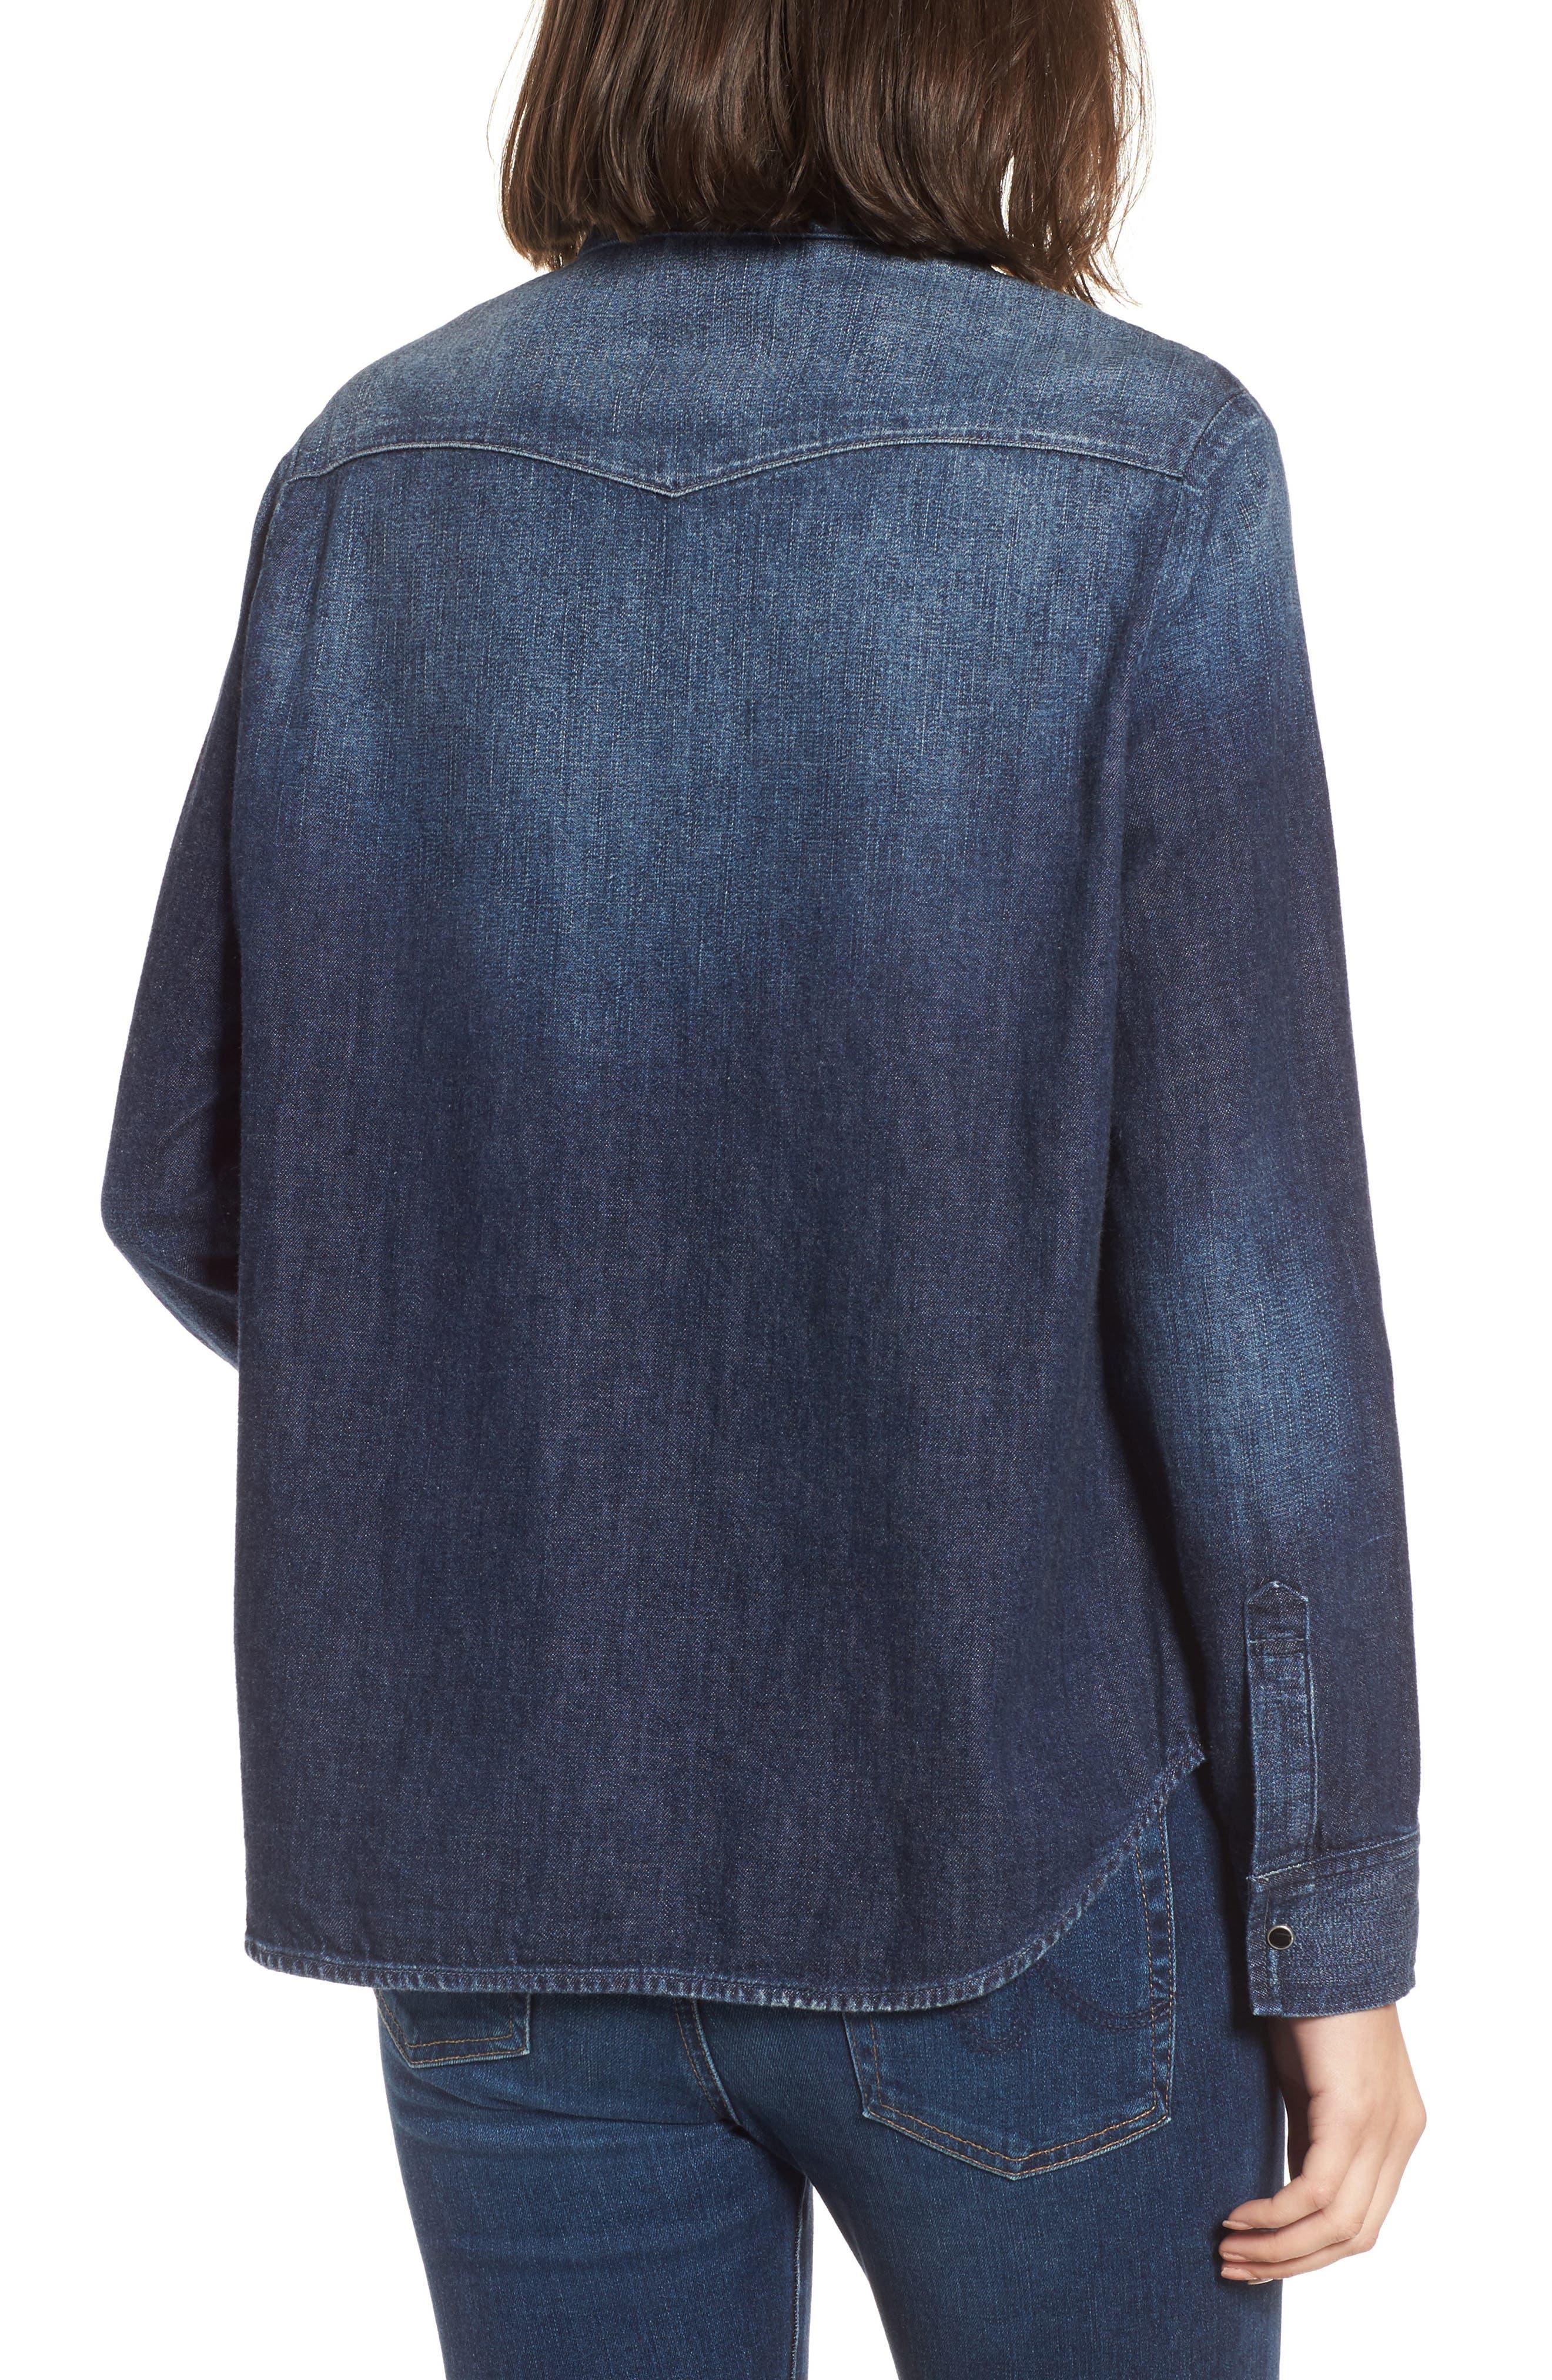 Deanna Denim Shirt,                             Alternate thumbnail 2, color,                             TIMELESS